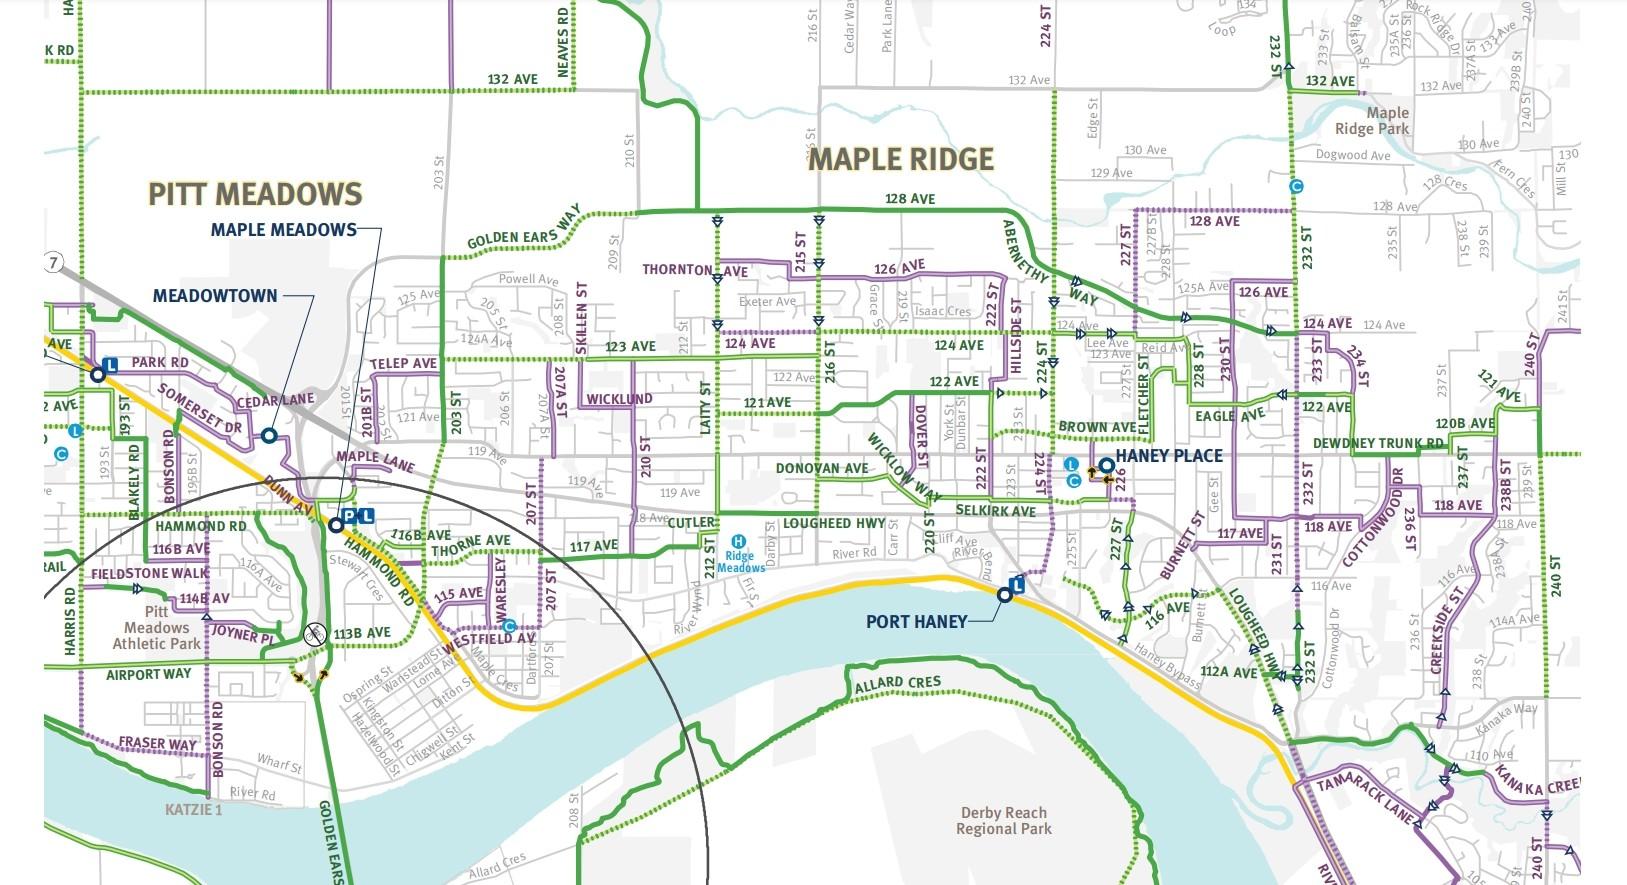 Maple Ridge bike map